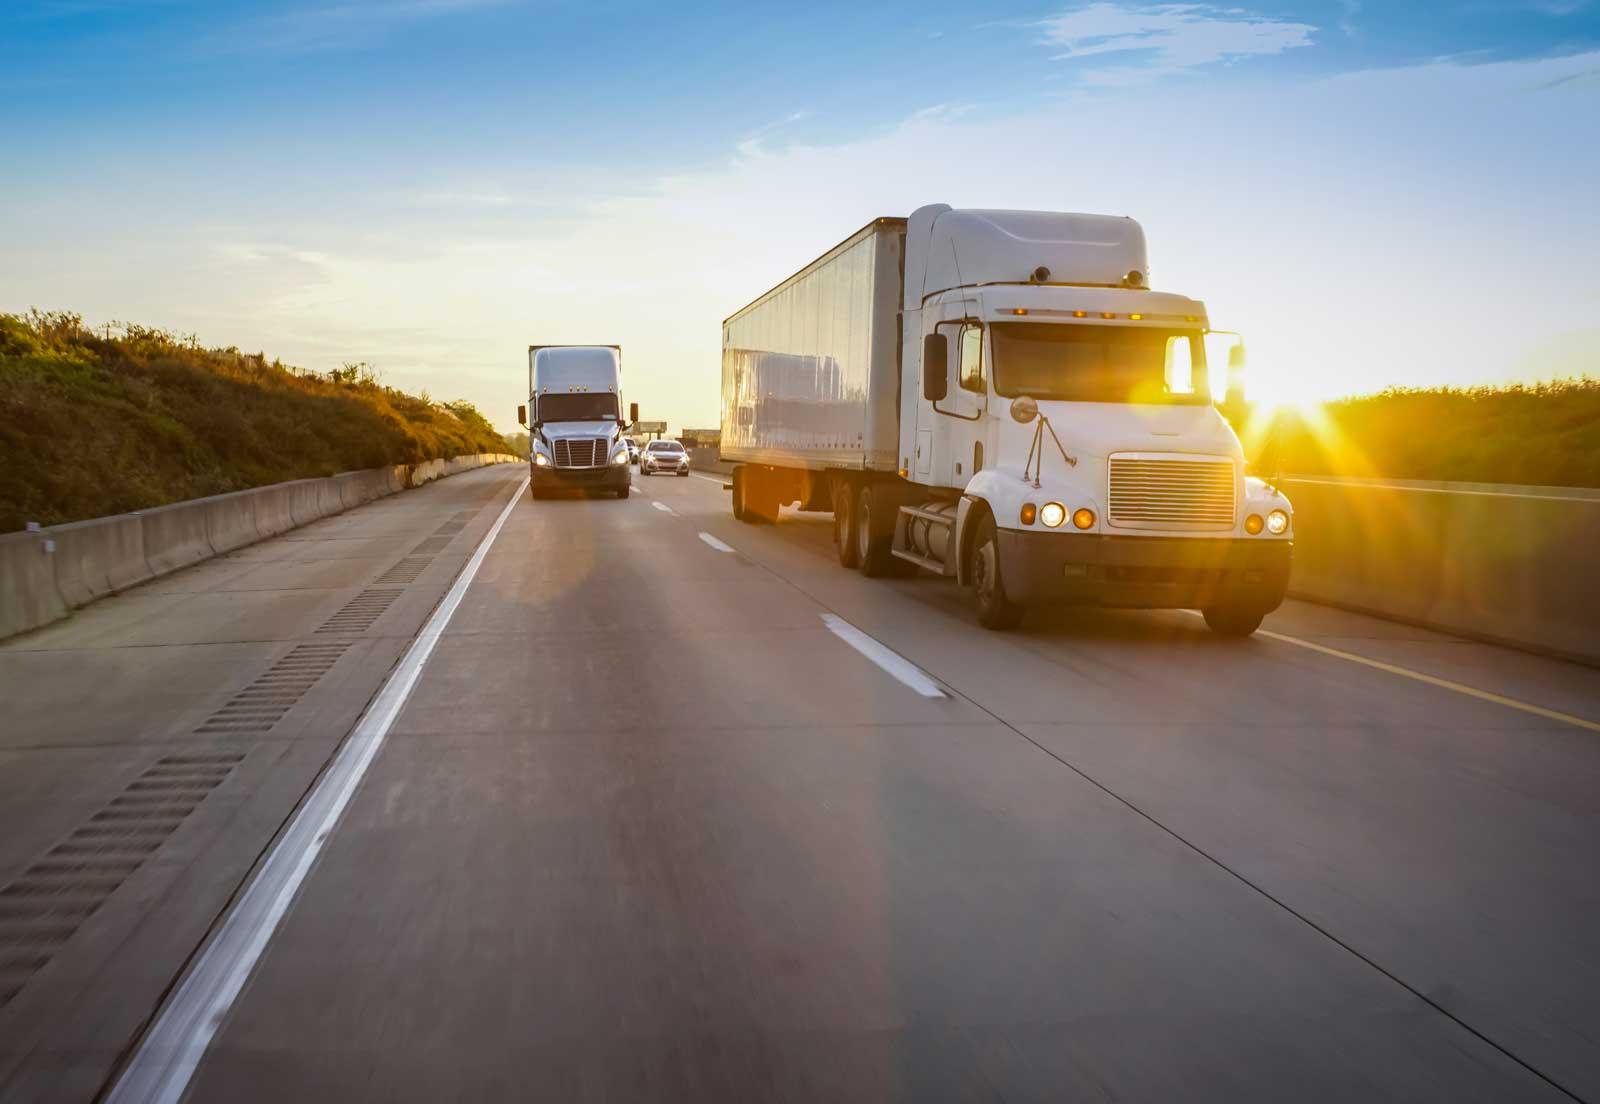 18-Wheeler & Semi-Truck Accidents